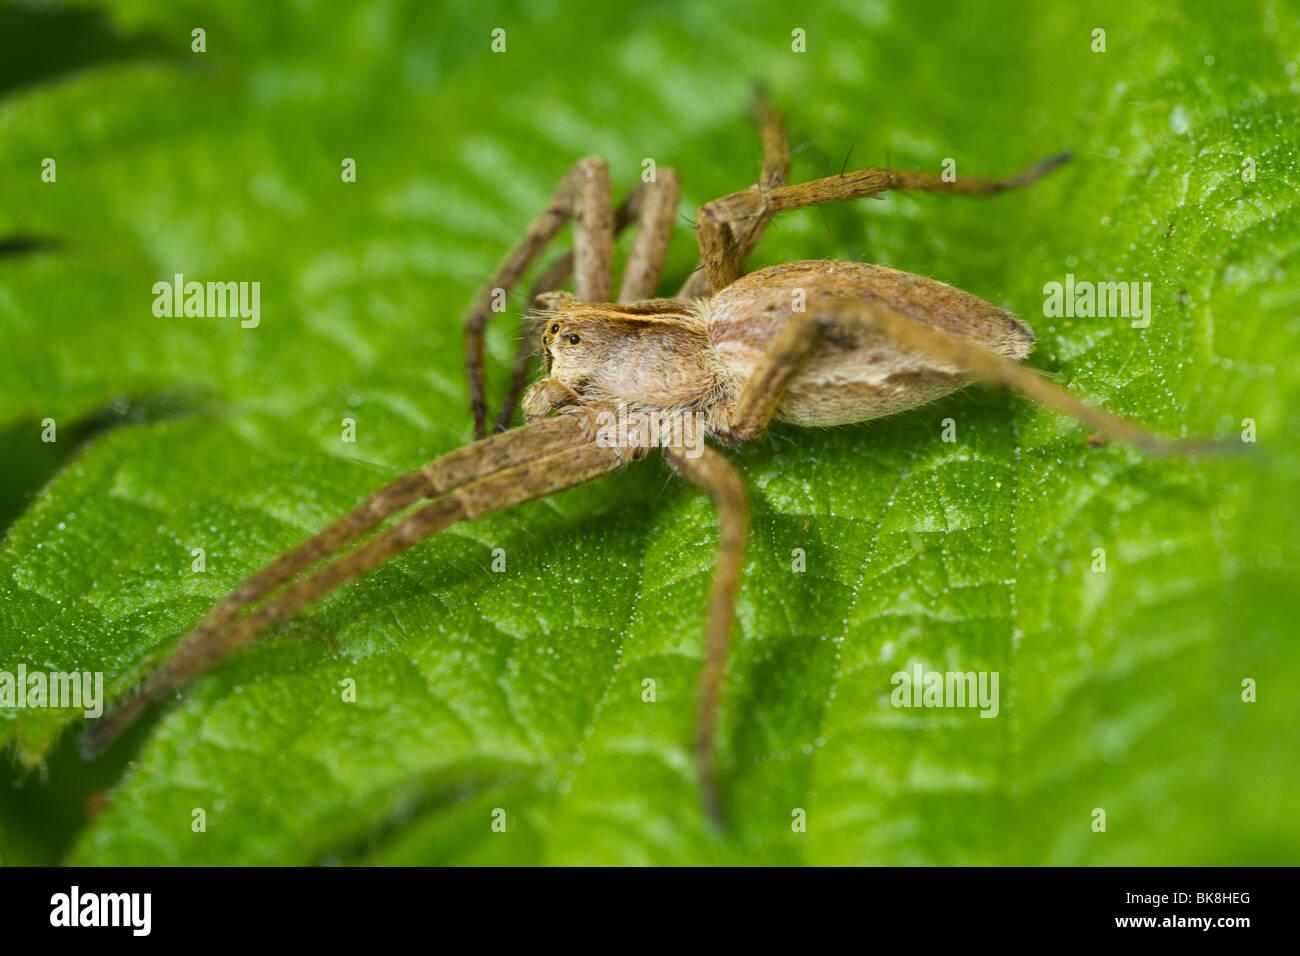 Nursery web spider (Pisaura mirabilis) - Stock Image